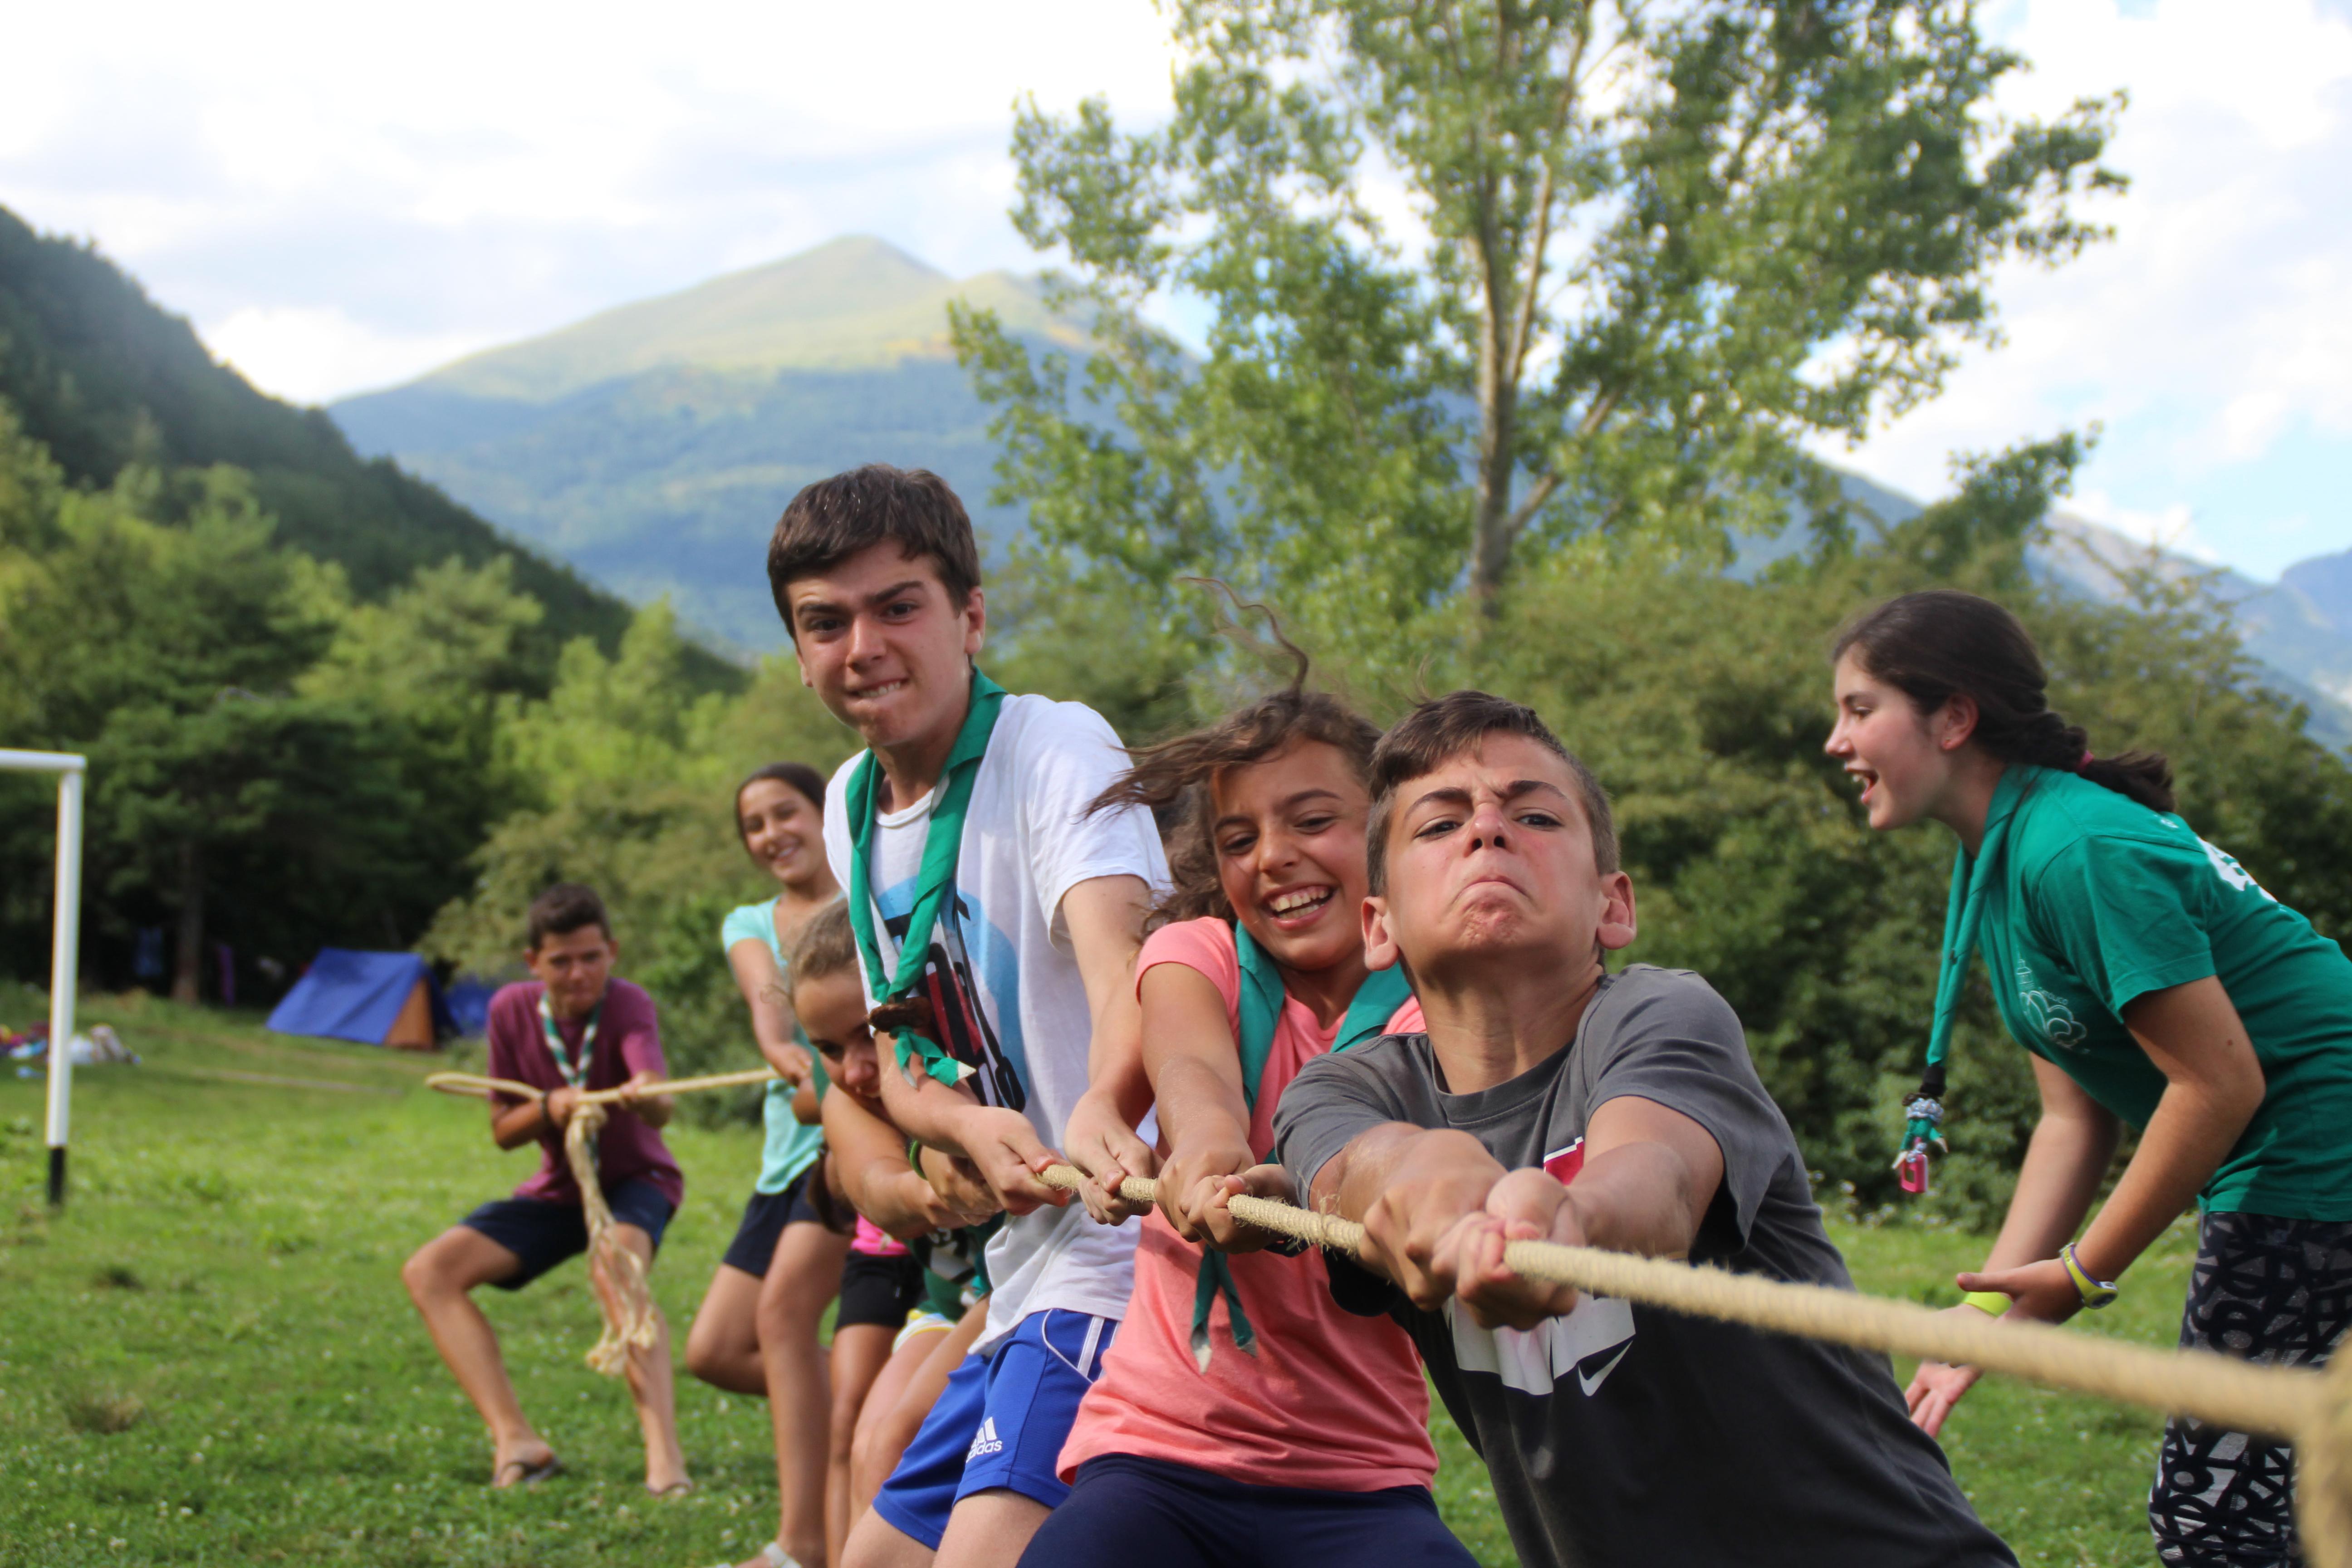 15-16 - Grupo - Campamento de verano - P221